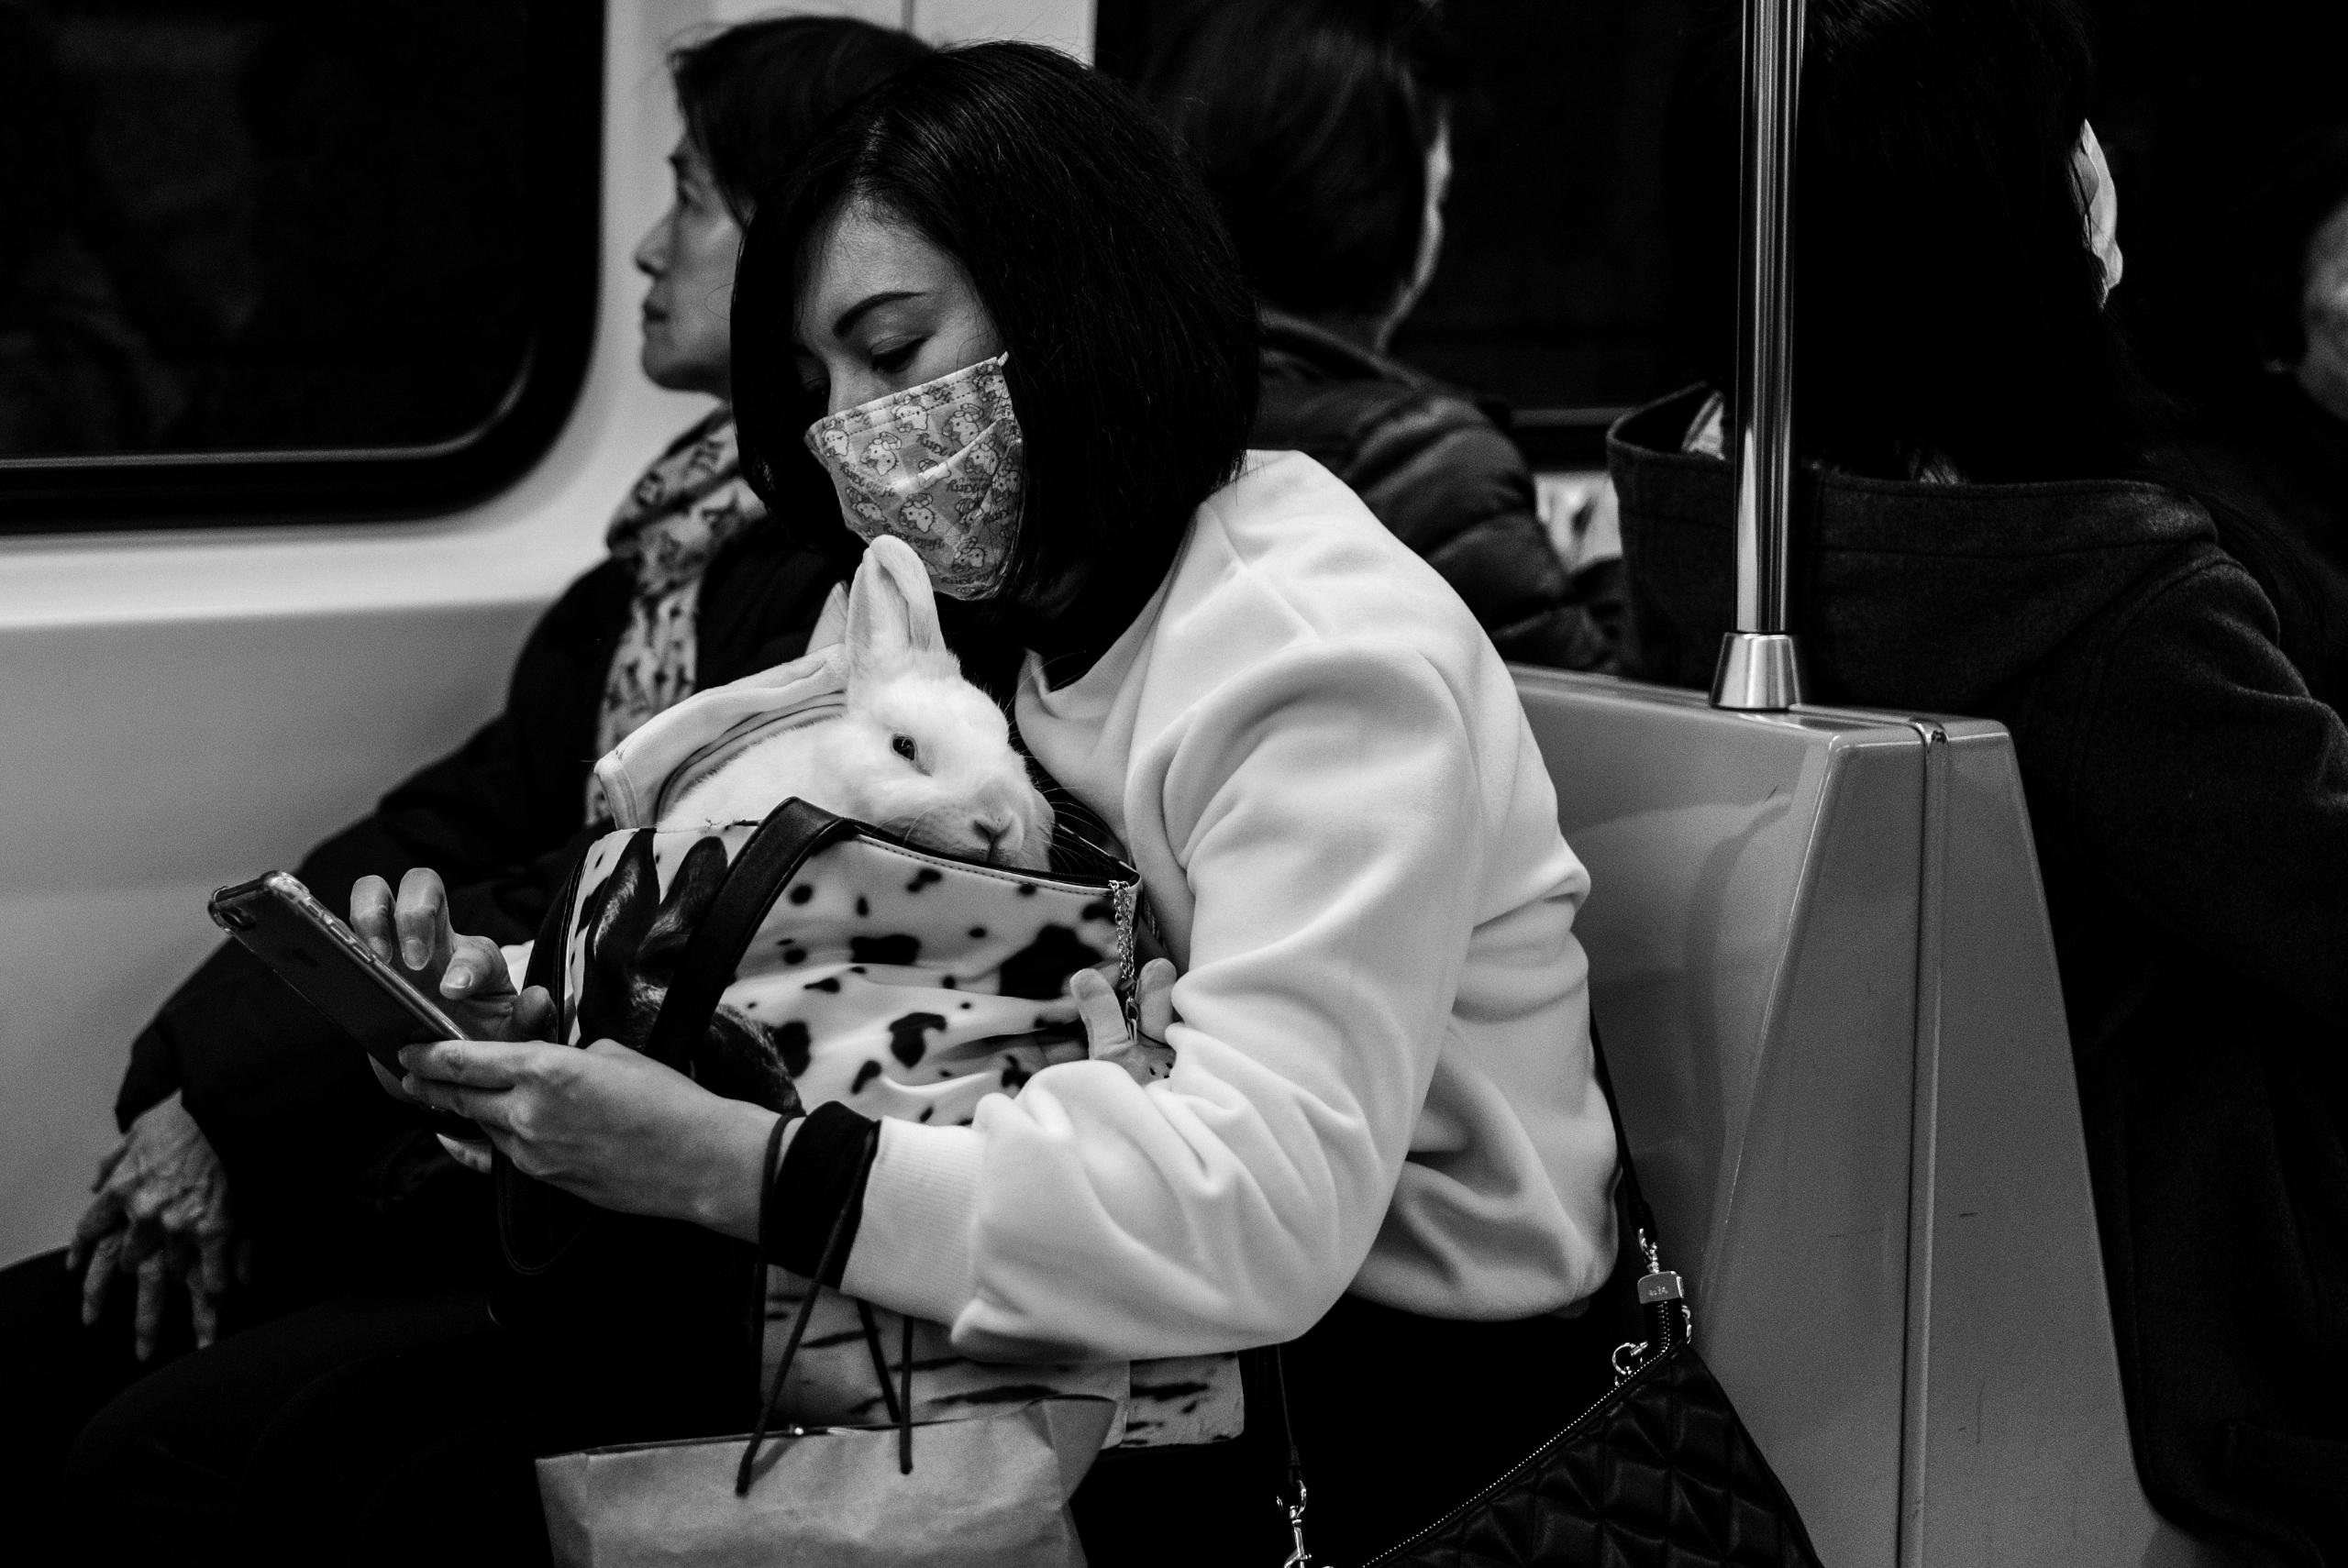 Taipei Metro riders. bunny ride - johnnyg_photography   ello